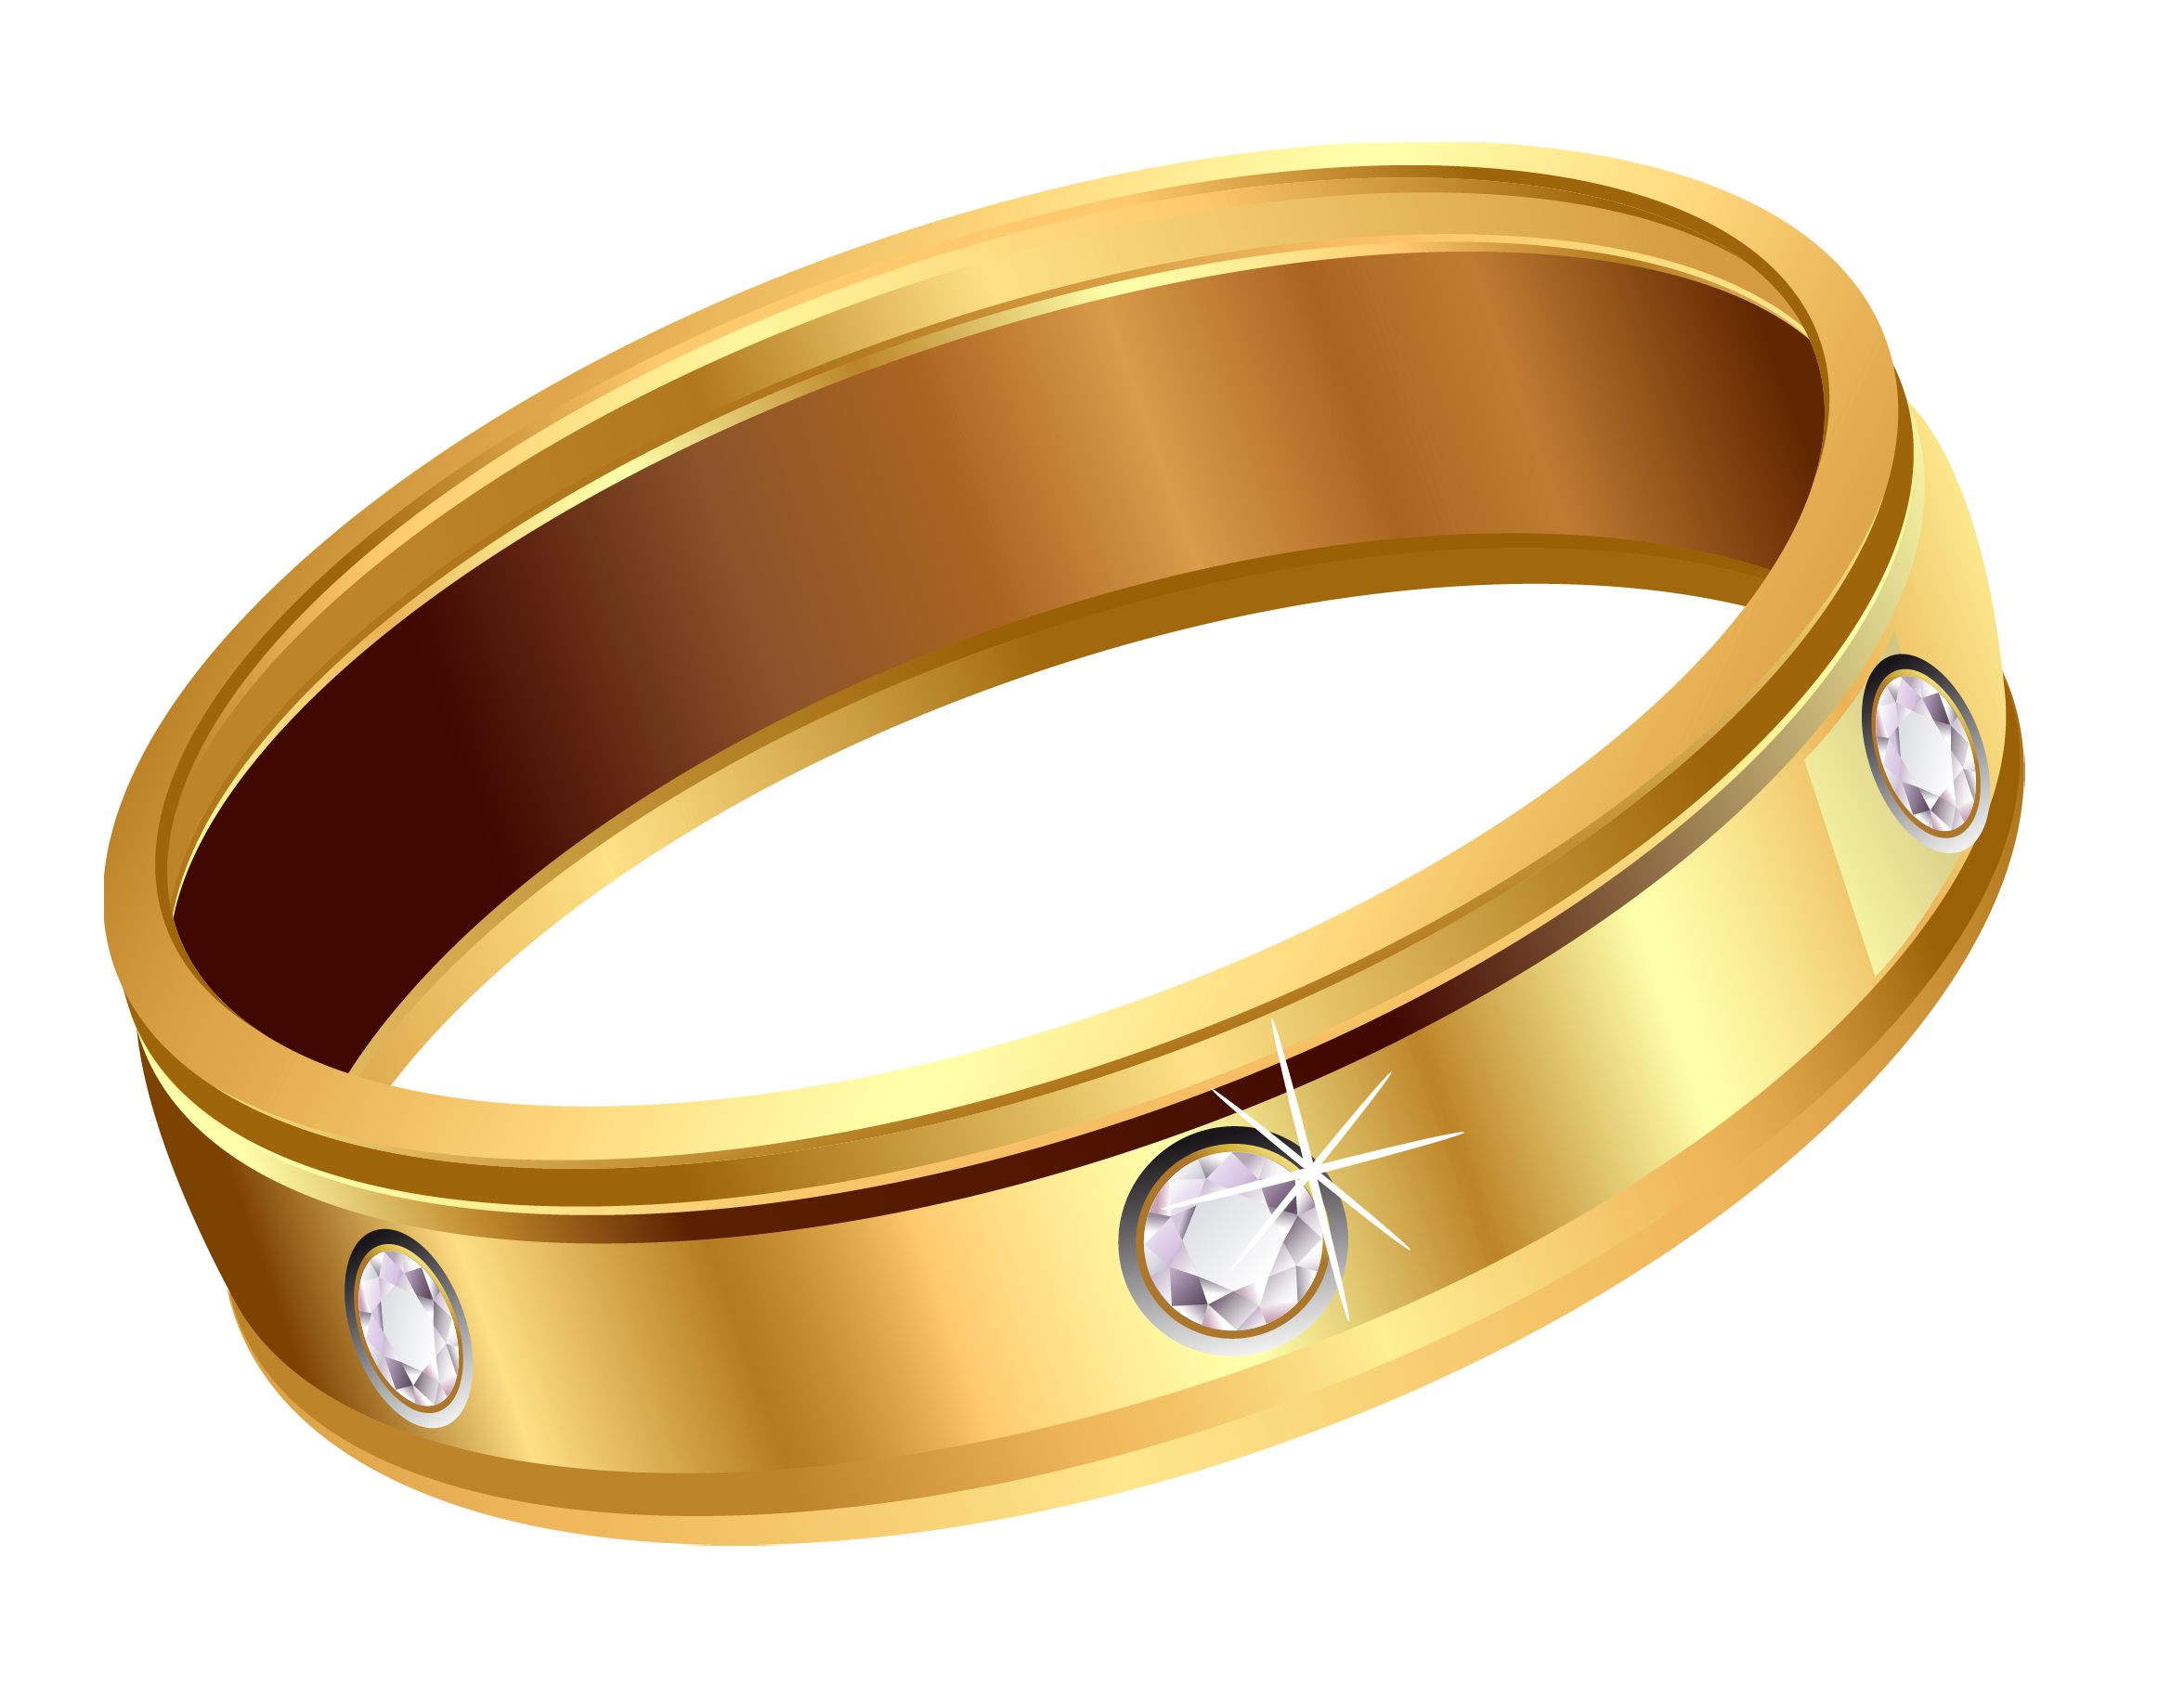 Gold rings clipart clip art transparent stock Transparent Gold Ring with Diamonds PNG Clipart | Gallery ... clip art transparent stock